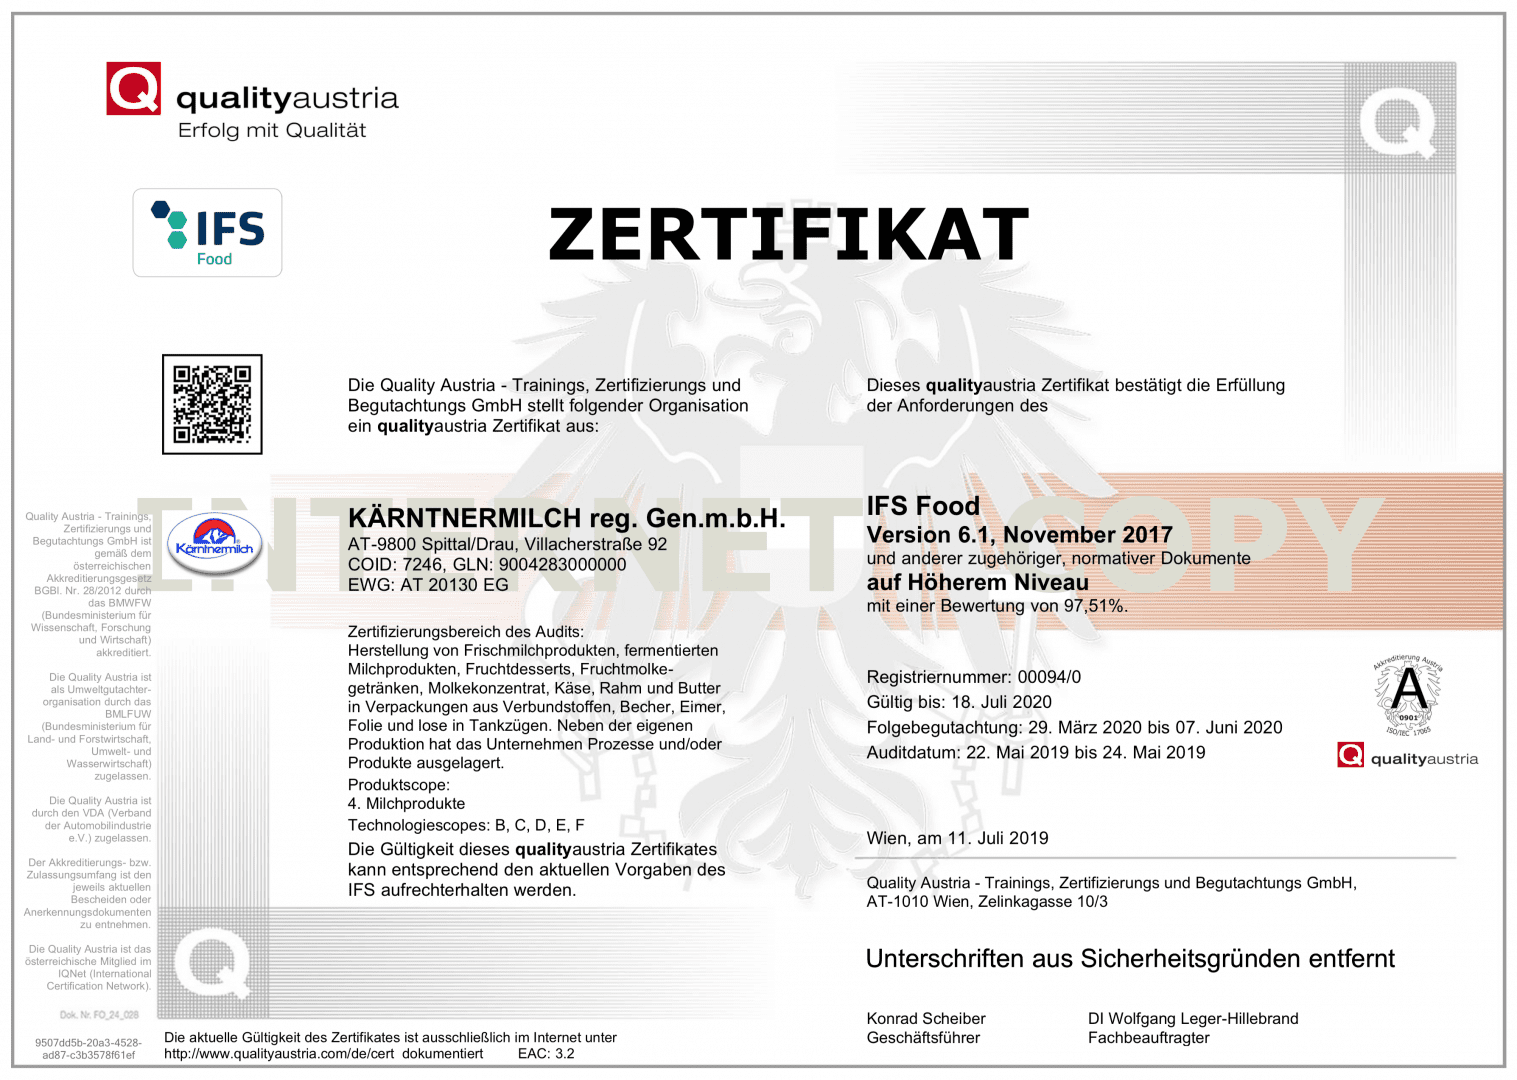 ifs-food-zertifikat-kaerntnermilch